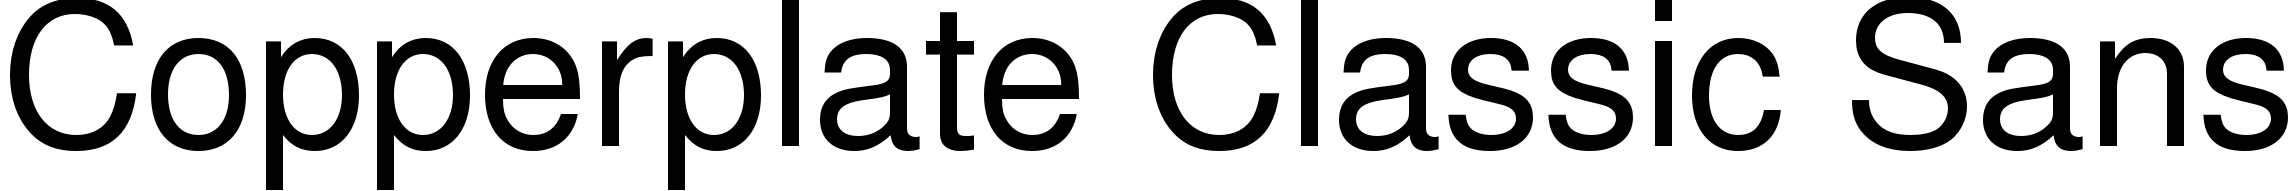 Copperplate Classic Sans